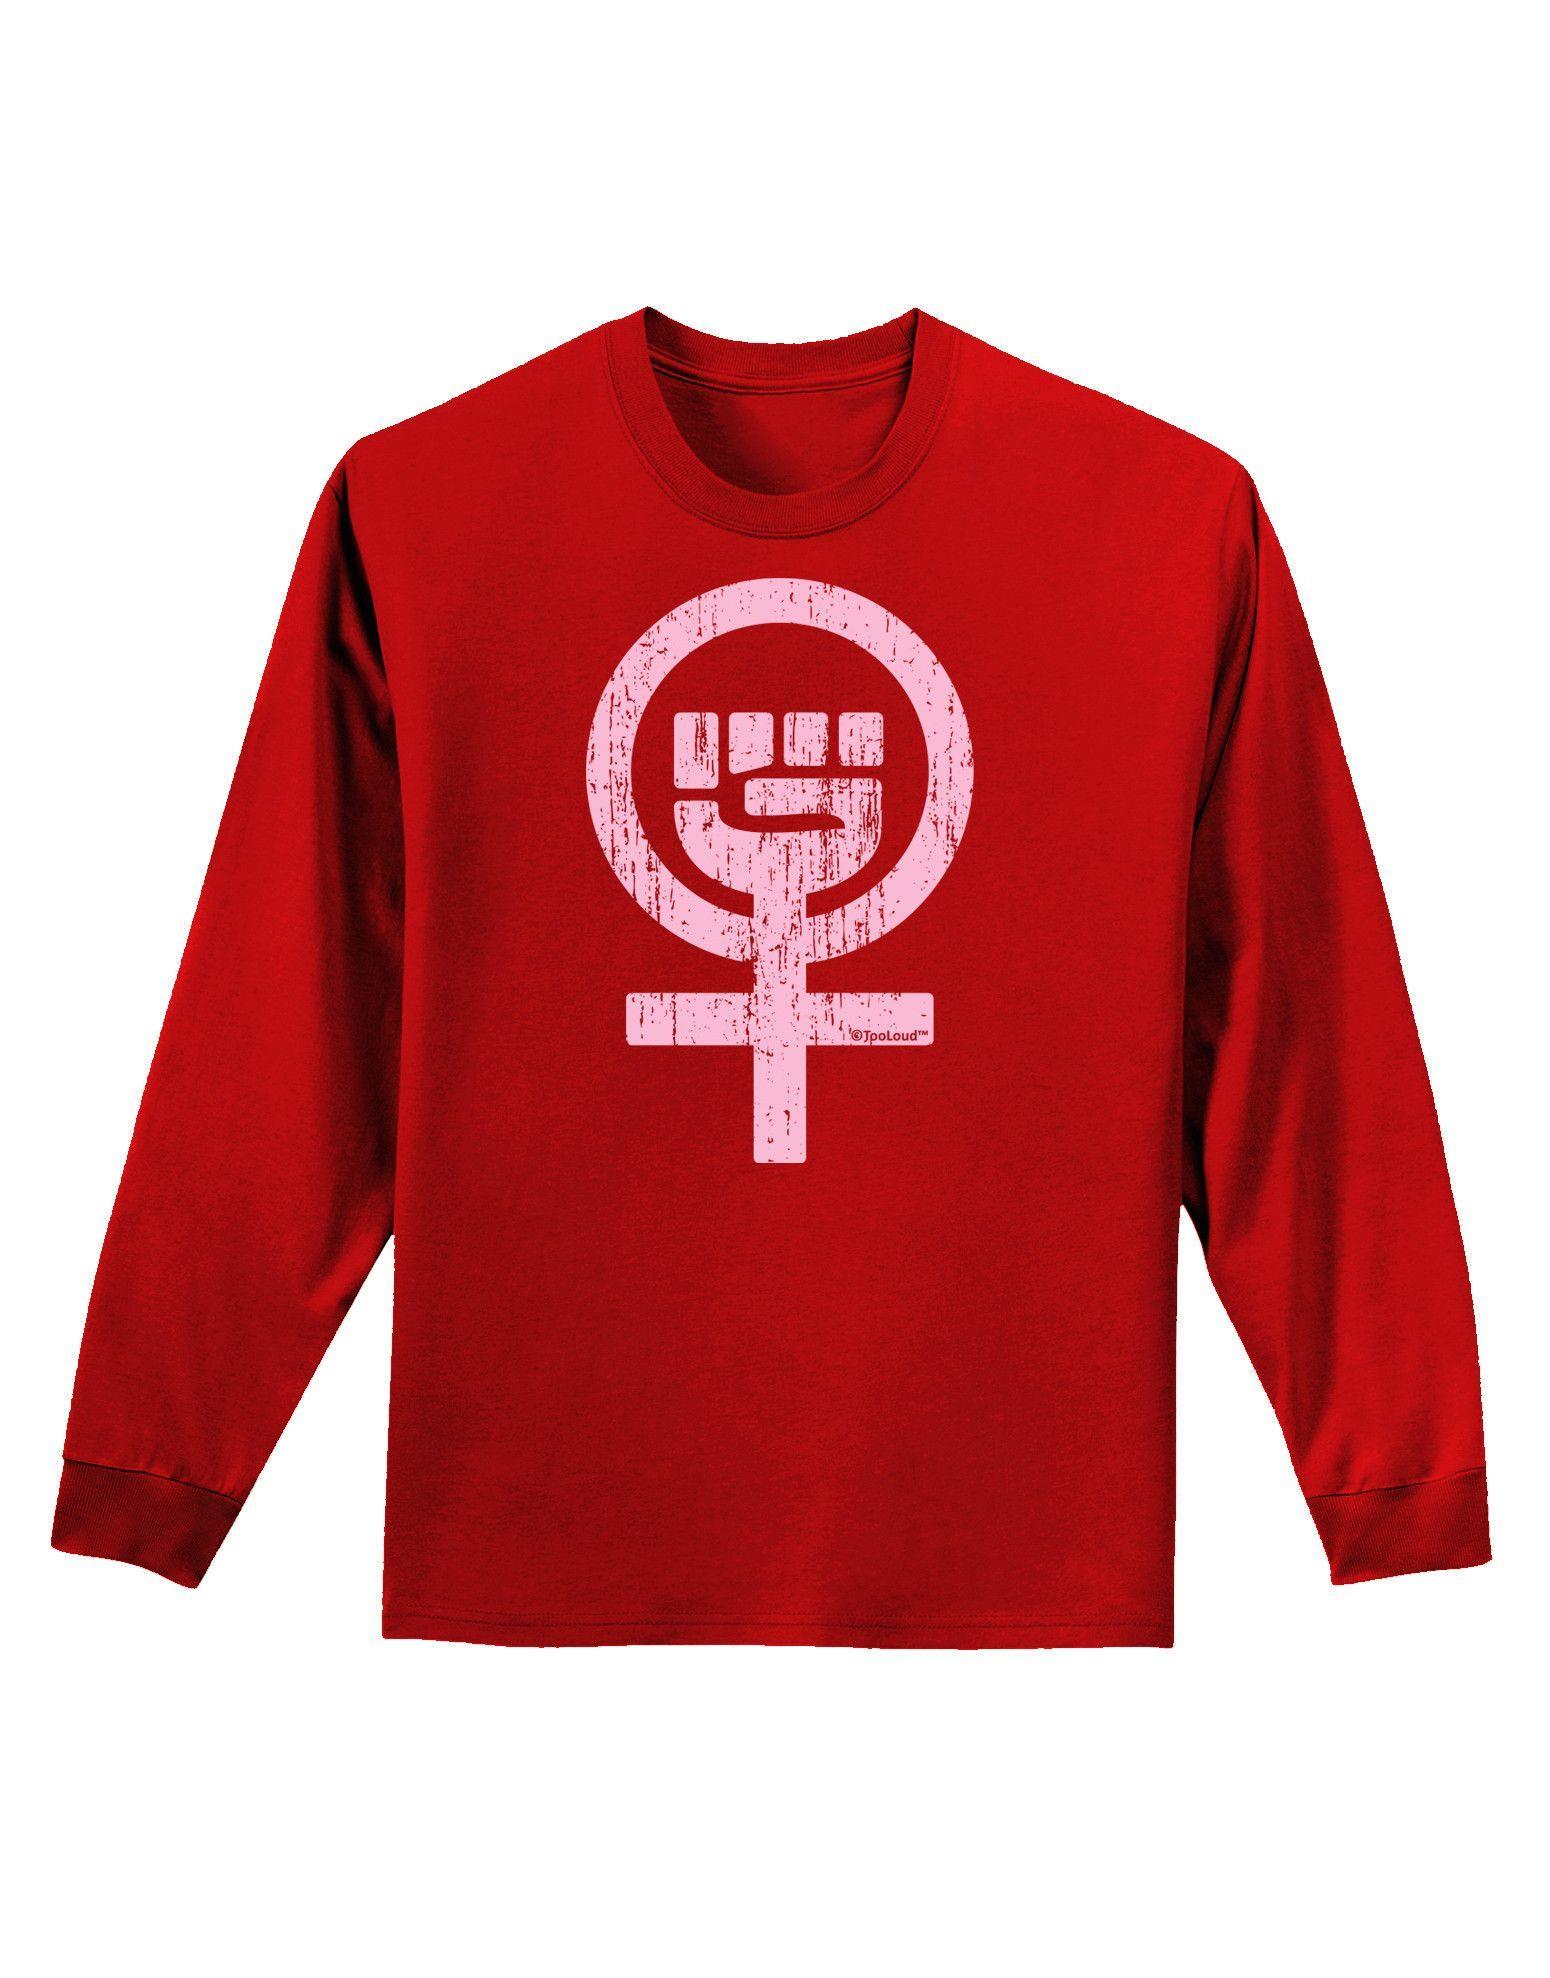 TooLoud Pink Distressed Feminism Symbol Infant T-Shirt Dark